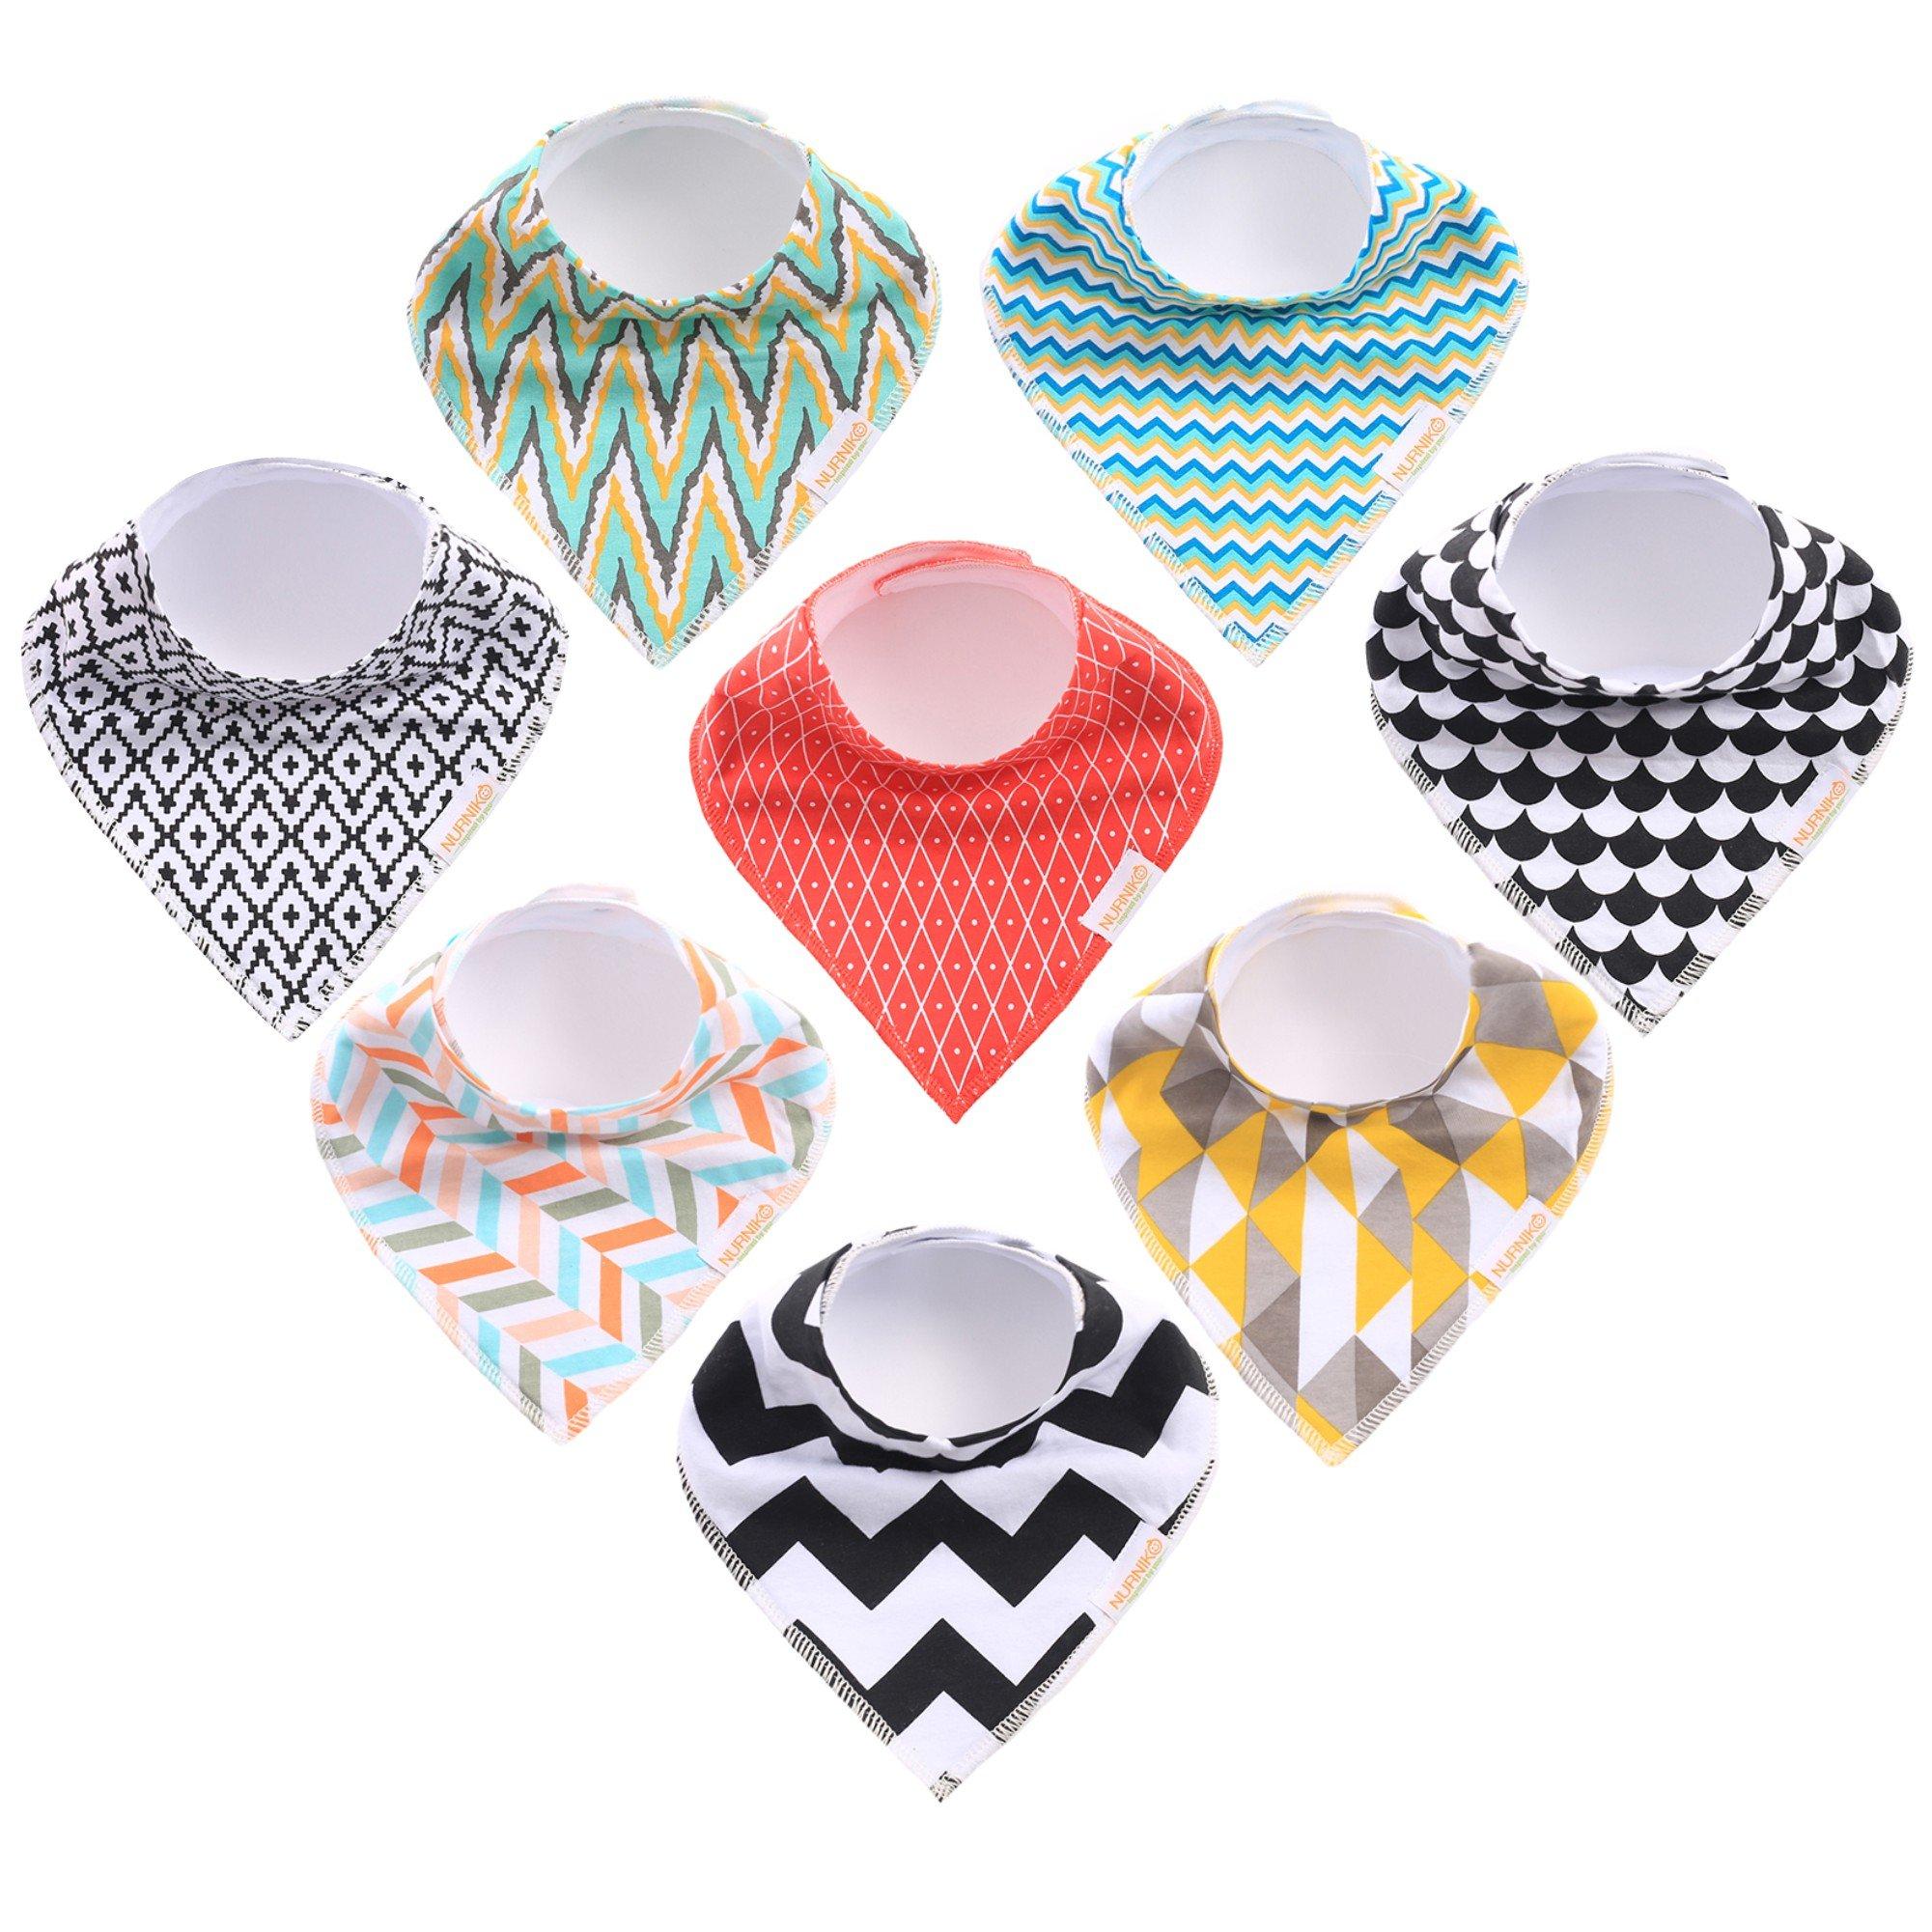 Nurniko Baby Bandana Drool Bibs | for Boys & Girls Fashionable Neutral Gender Soft Organic Cotton Set of 8